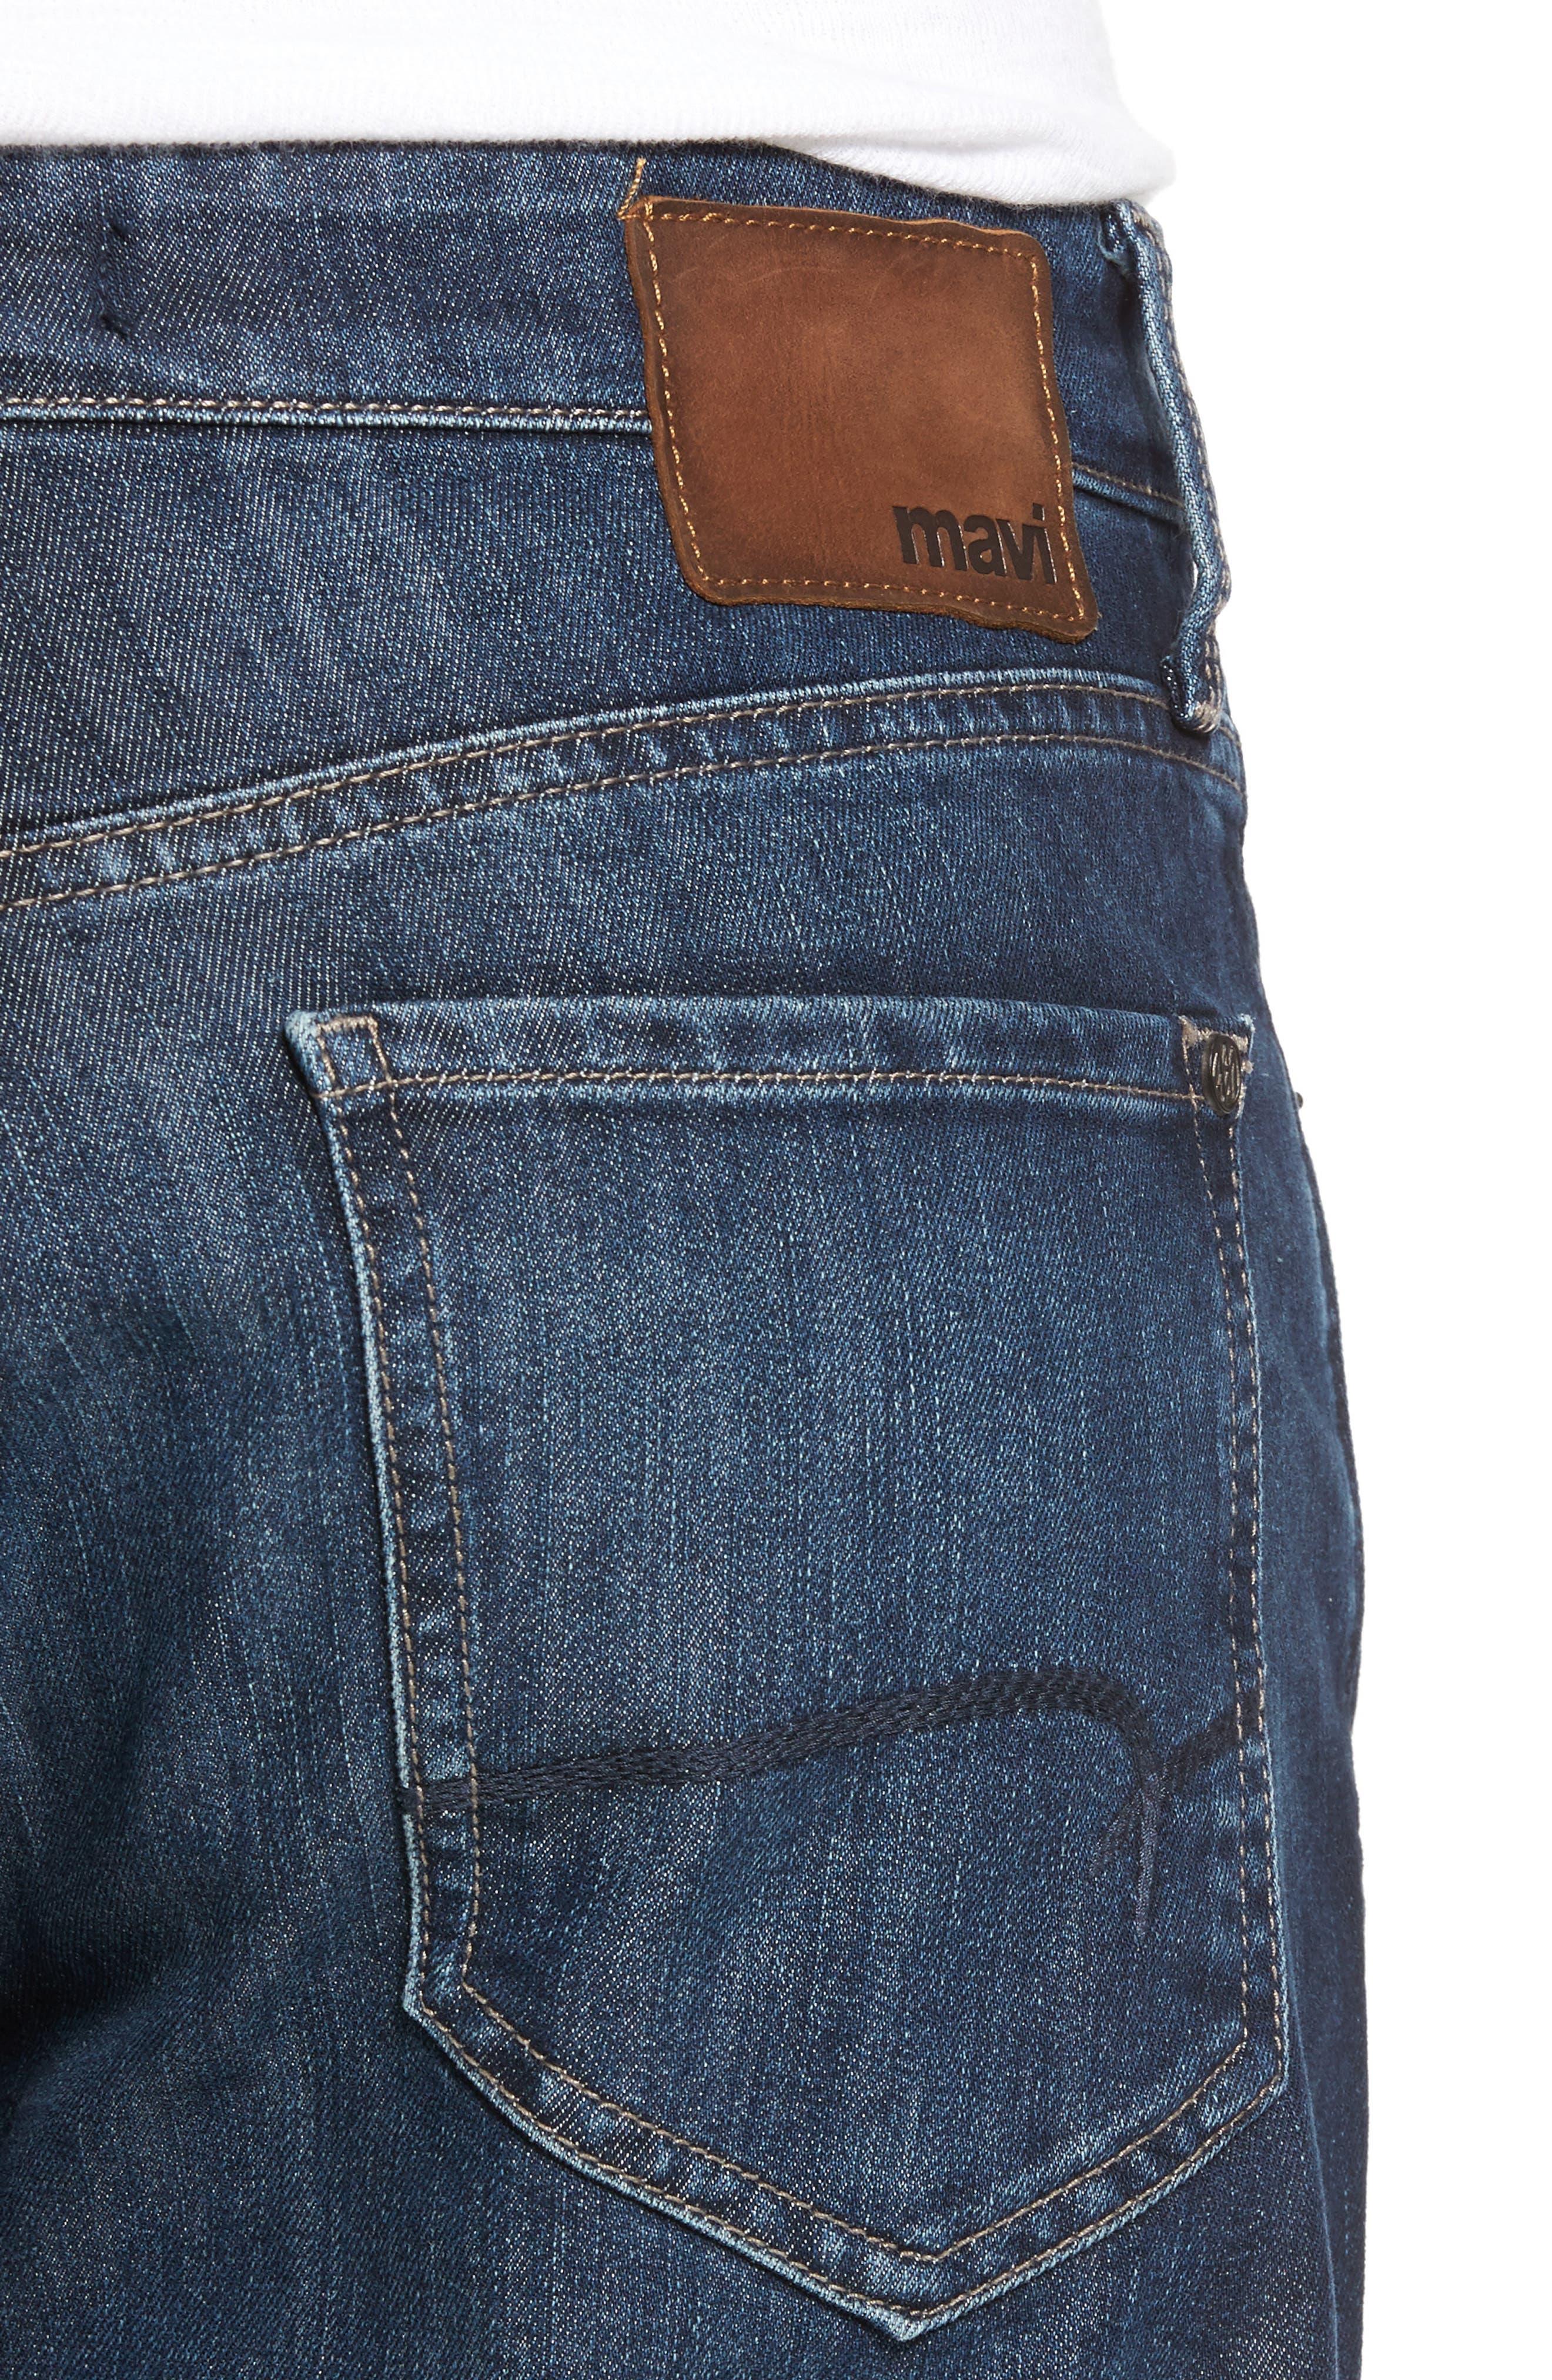 Myles Straight Leg Jeans,                             Alternate thumbnail 4, color,